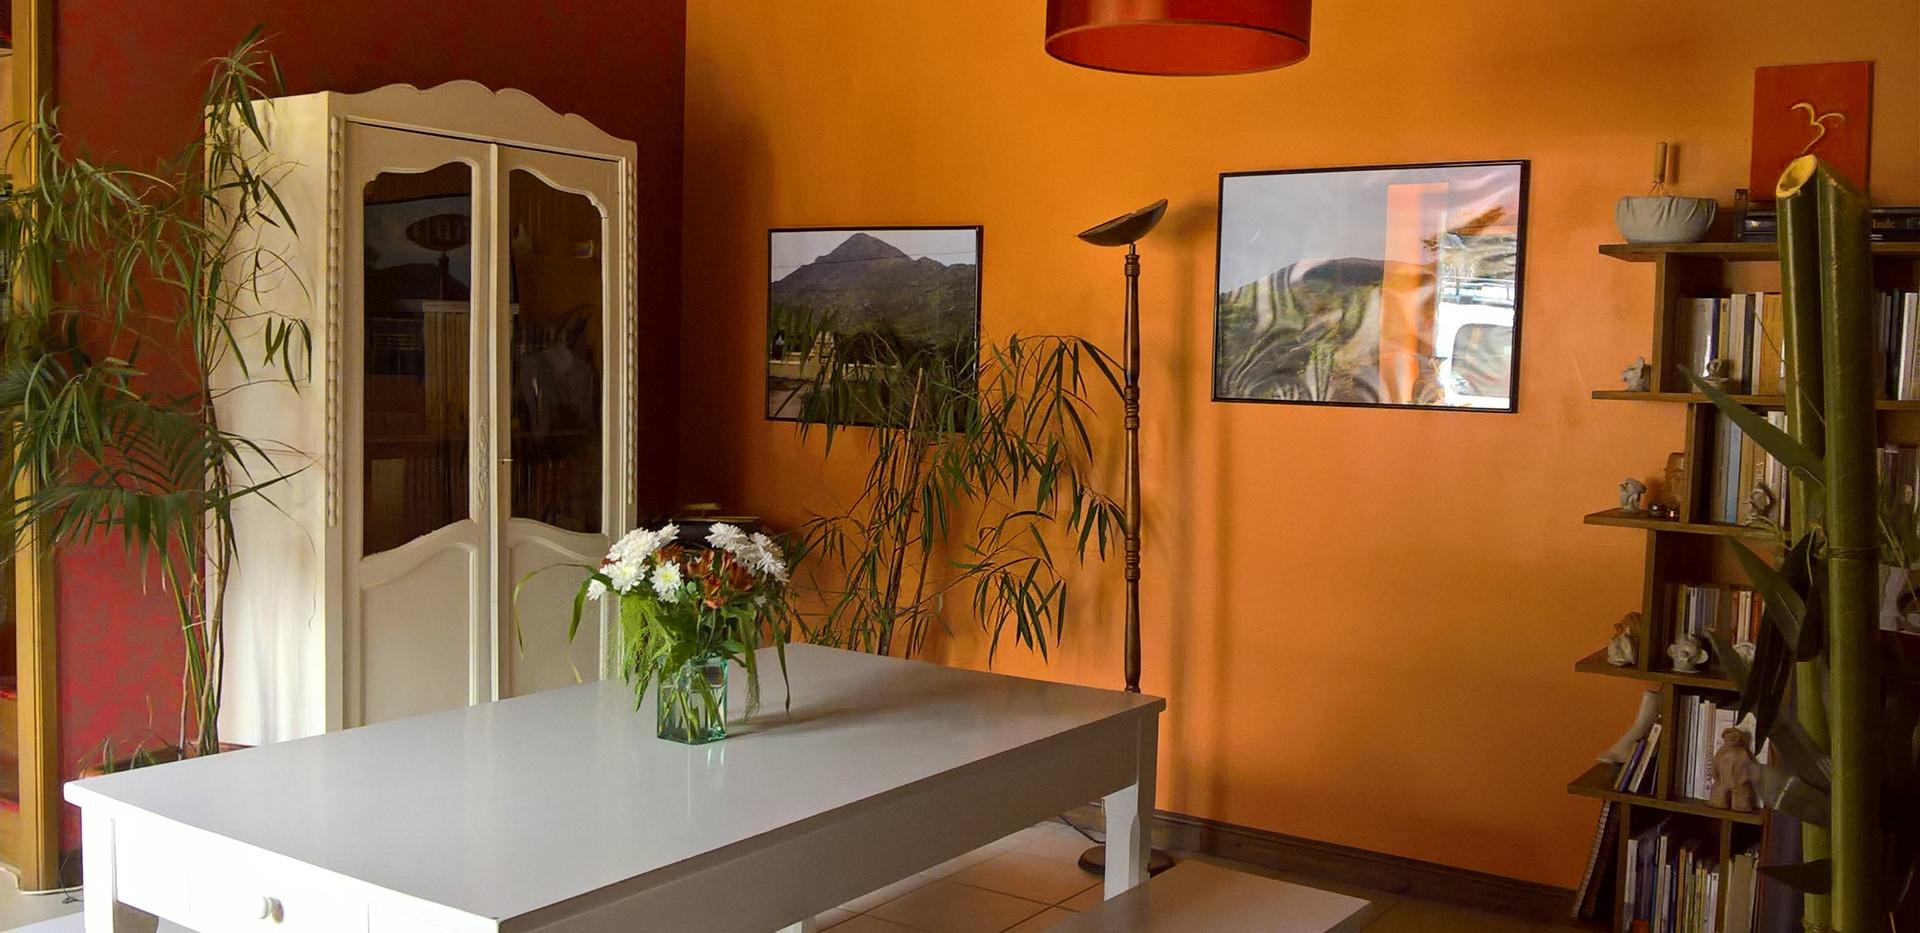 Le Salon de l'Espace Sankara